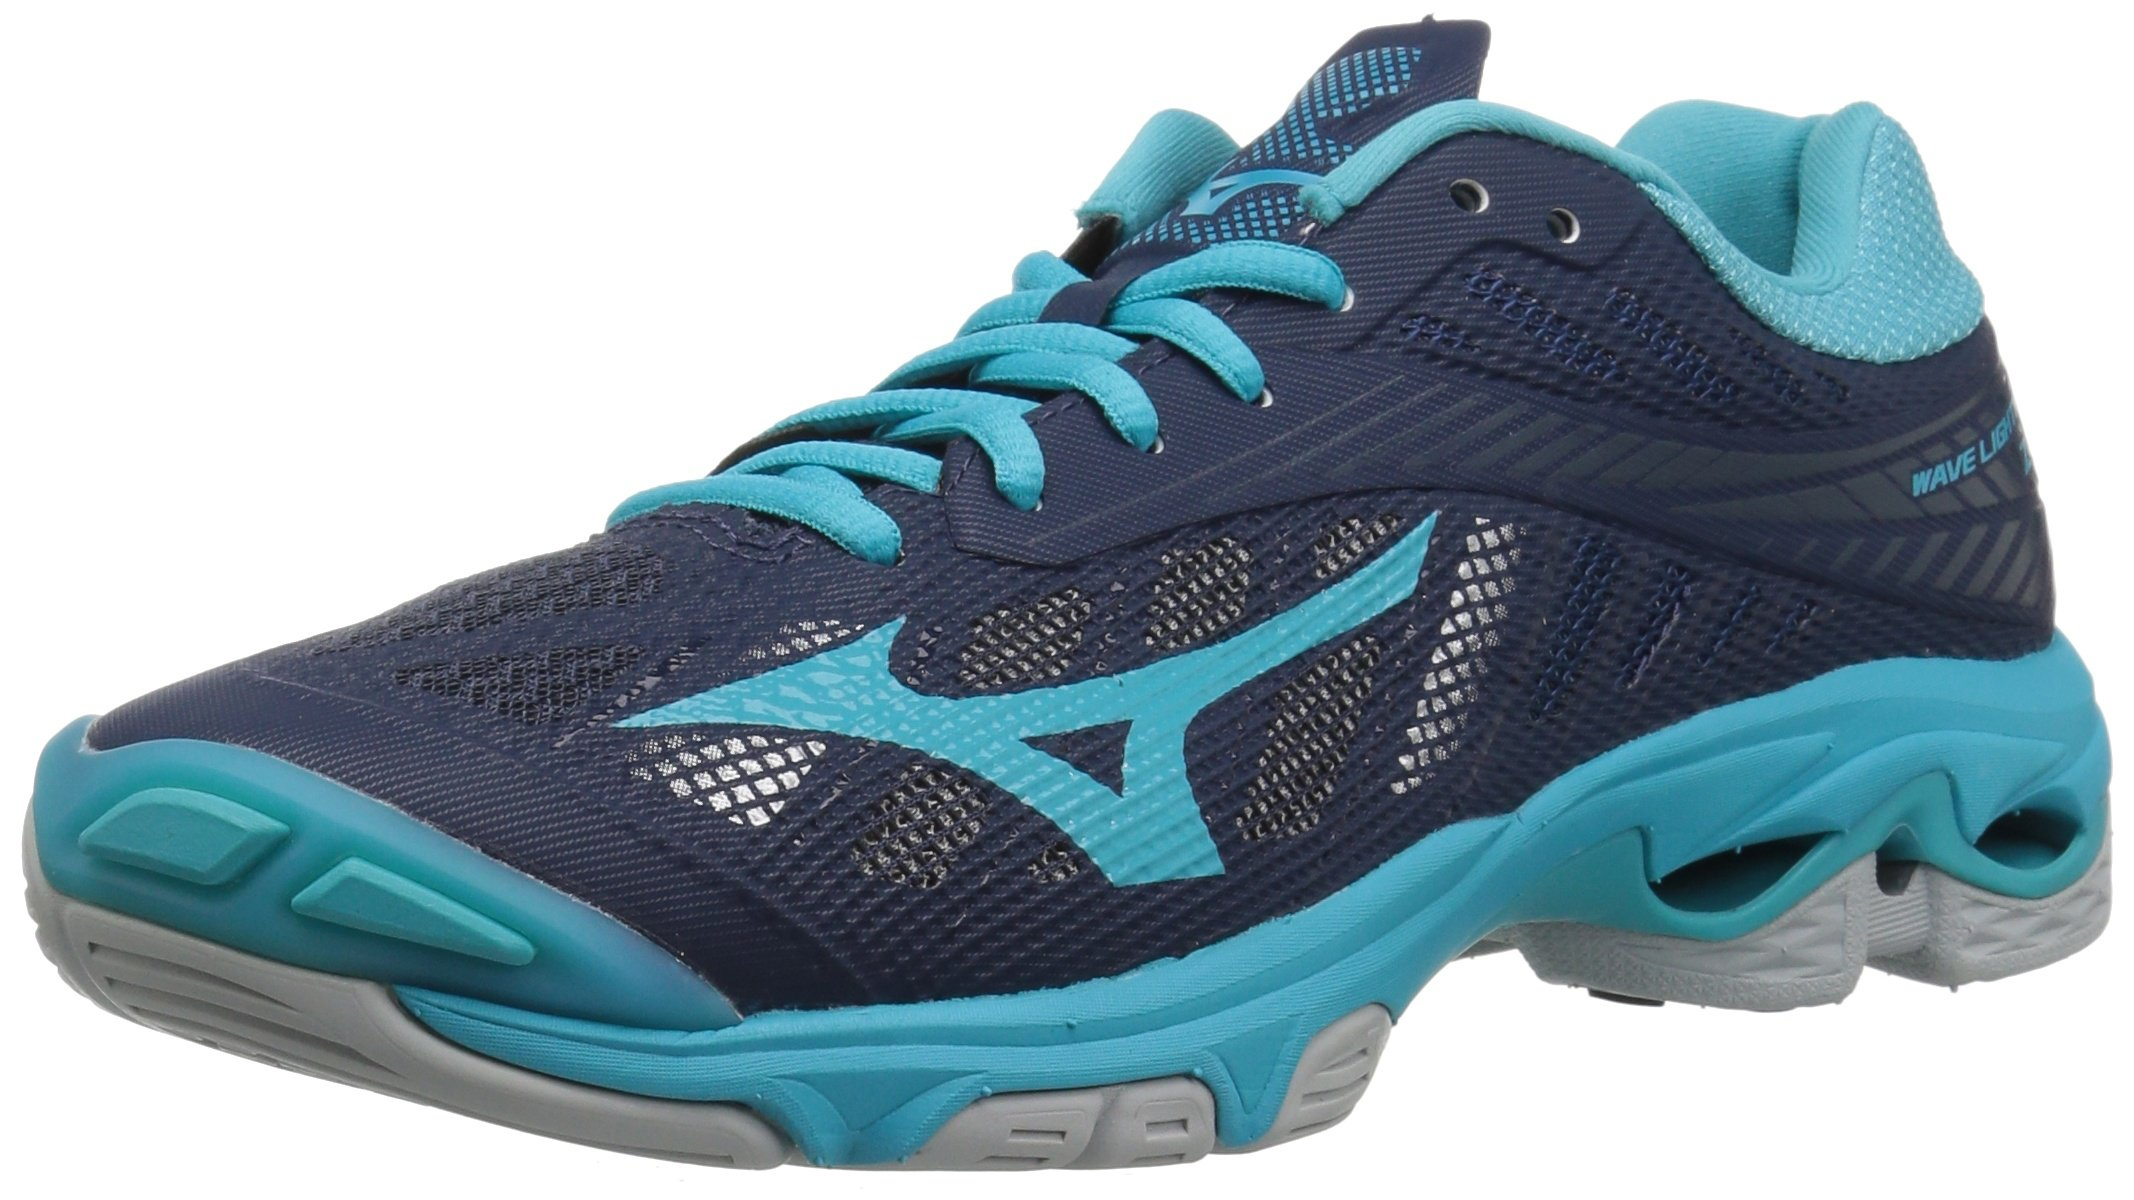 Mizuno Wave Lightning Z4 Volleyball Shoes, Navy/Aqua Blue, Women's 9.5 B US